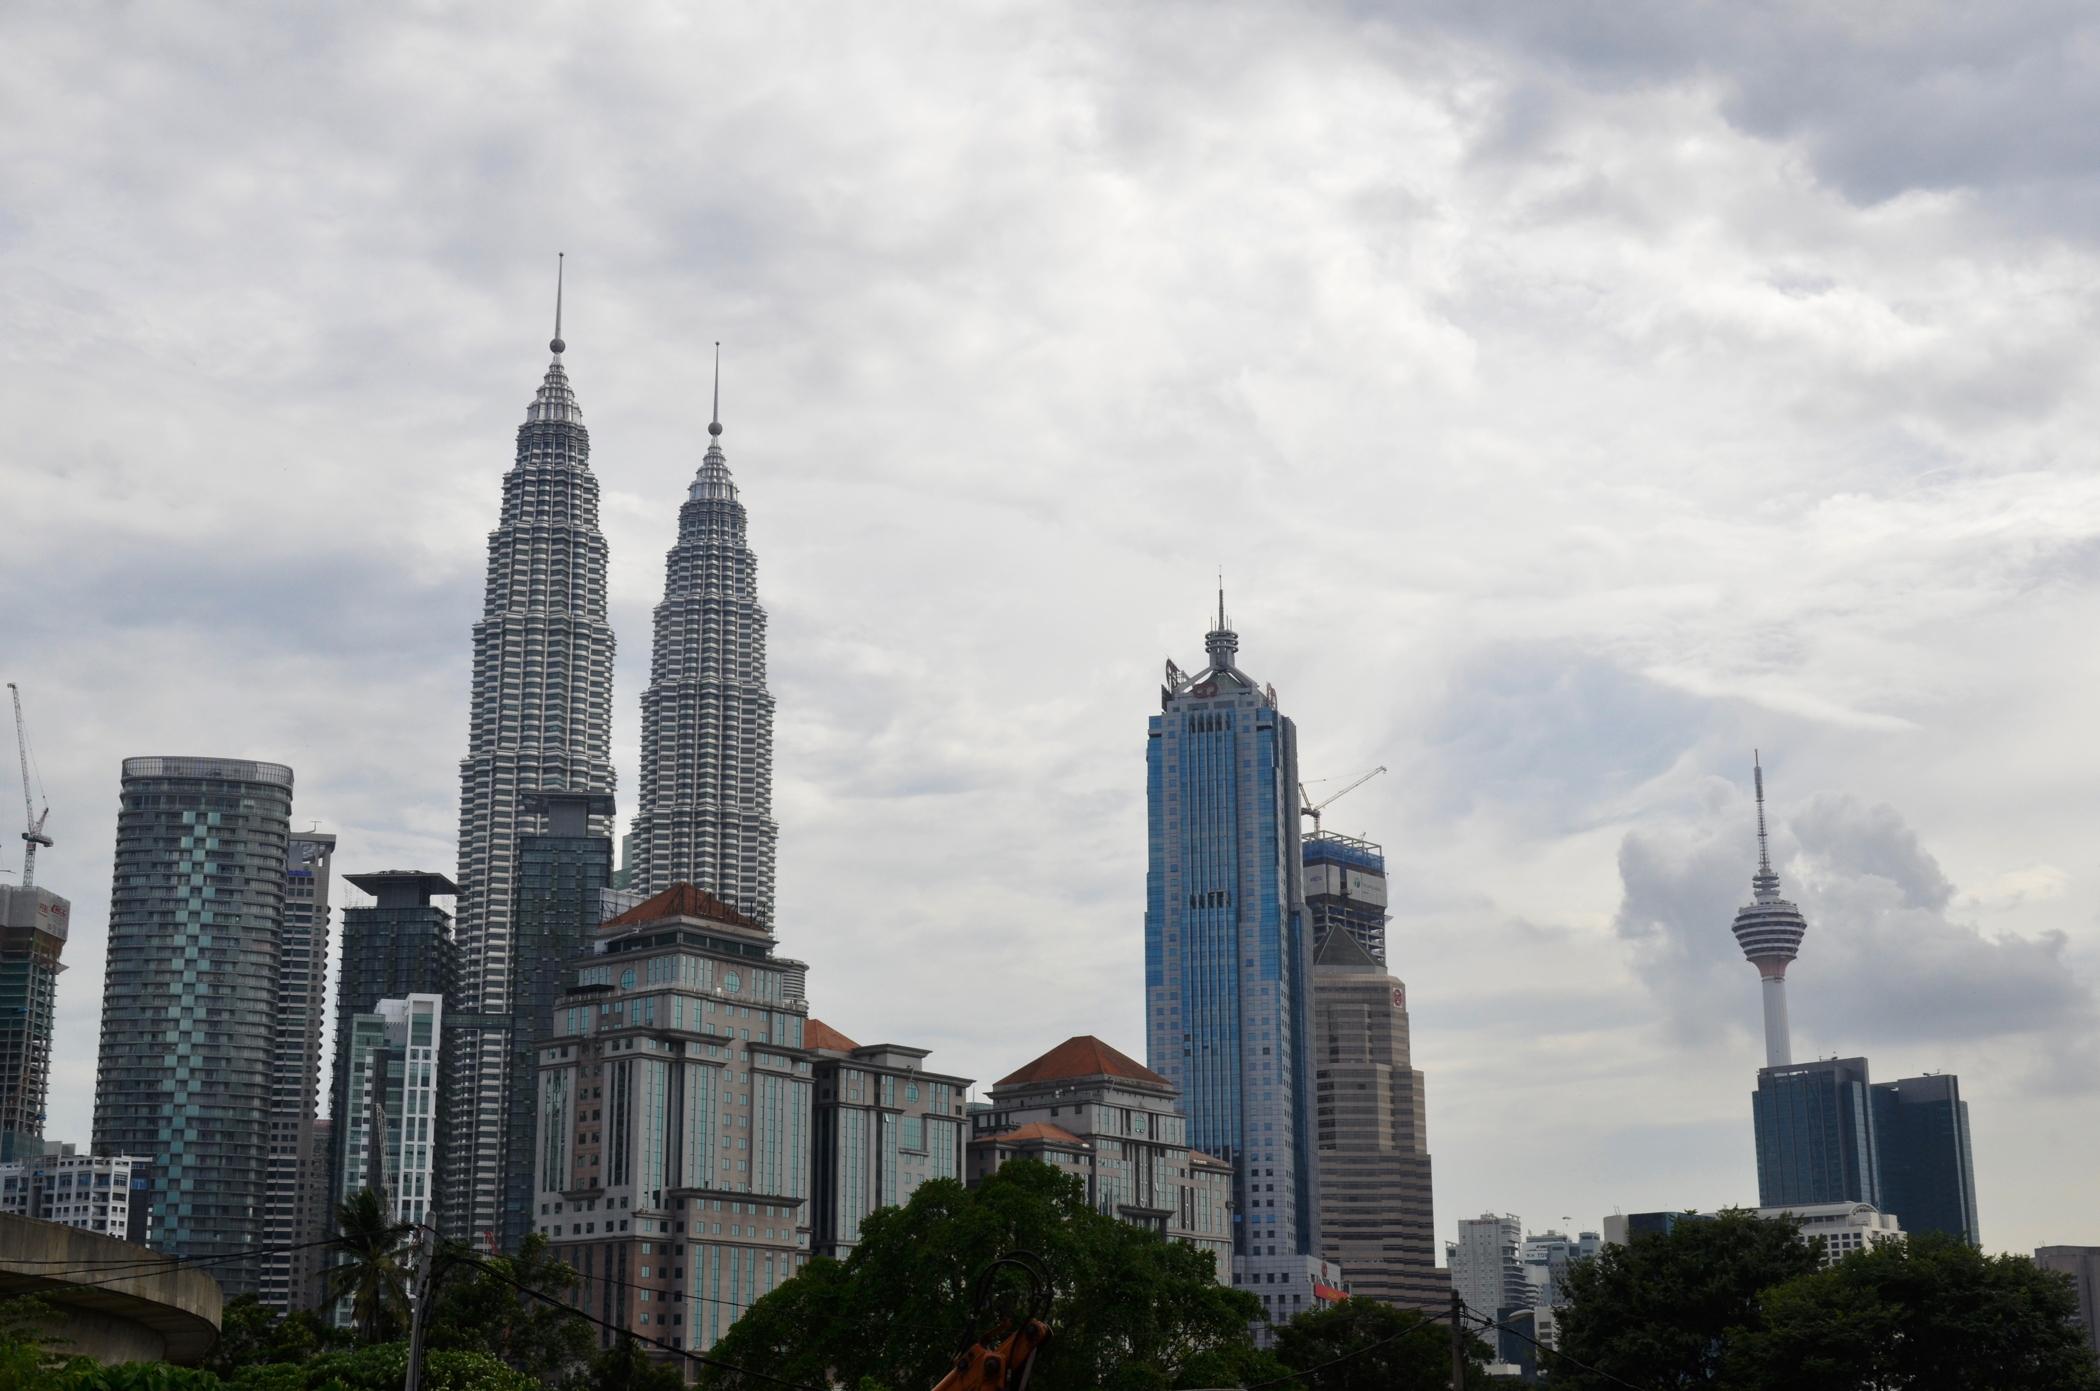 Großstadtdschungel-Malaysia-Kuala-Lumpur-Petronas-Towers-Aussicht